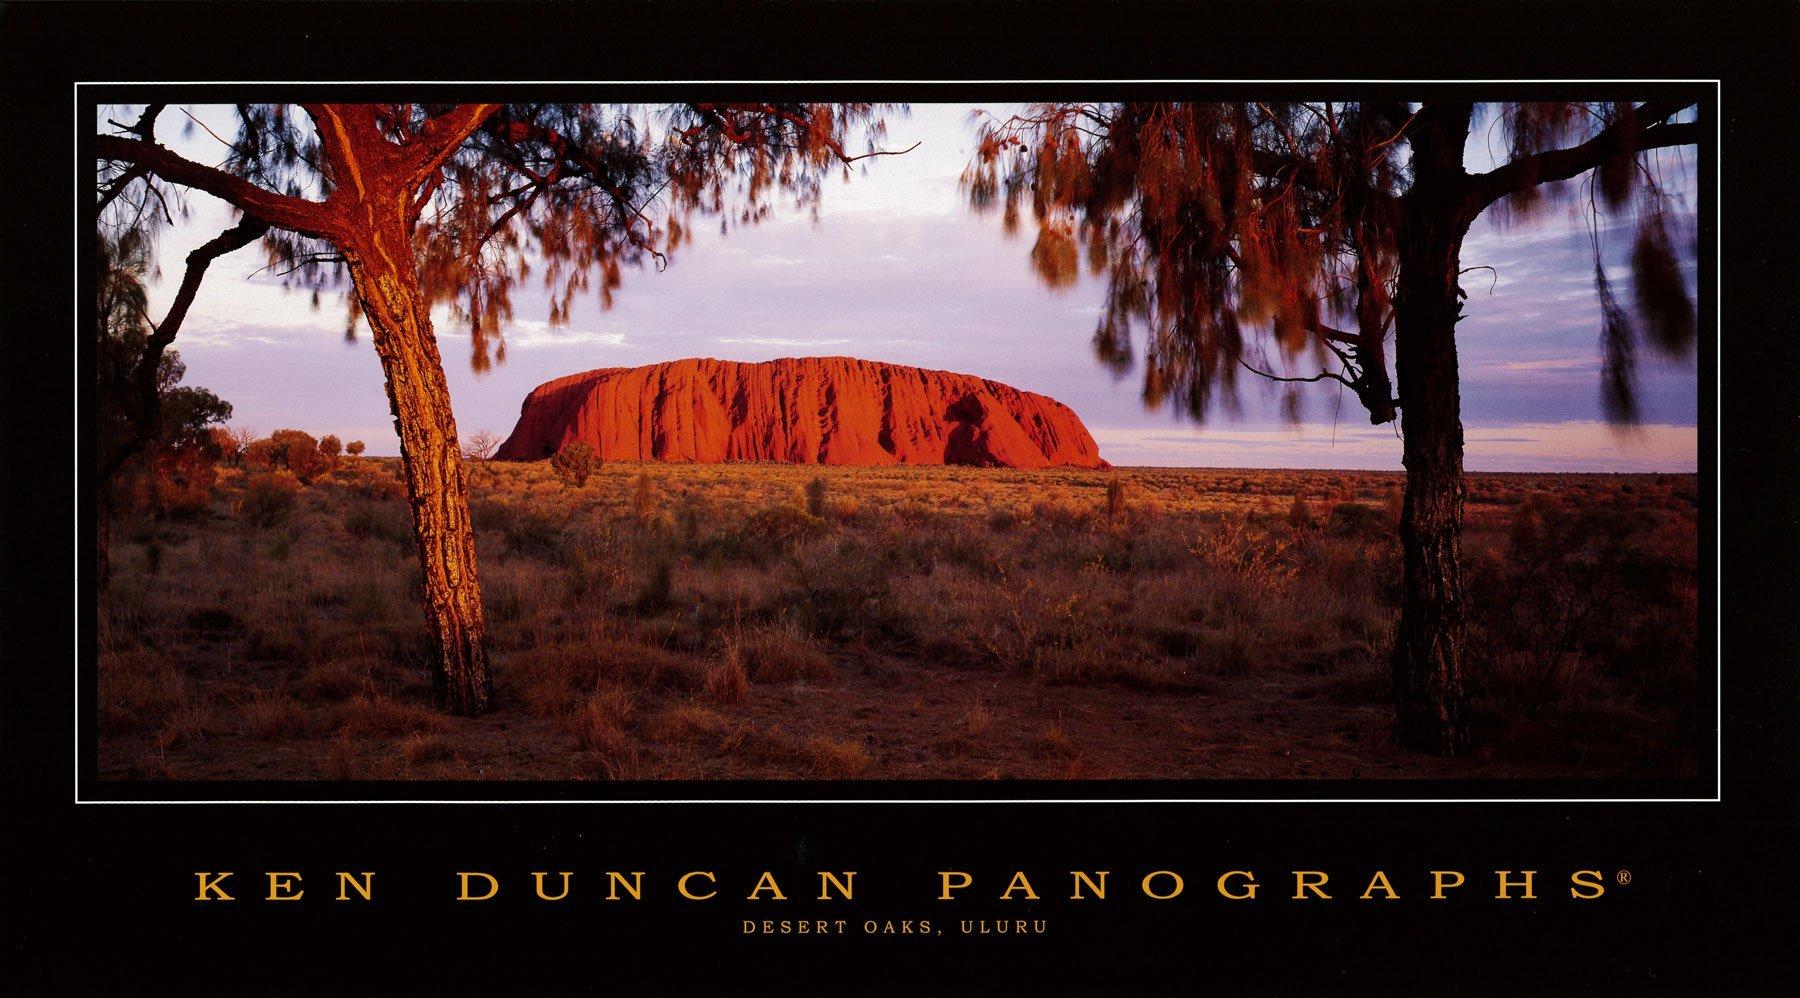 Desert Oaks, Uluru